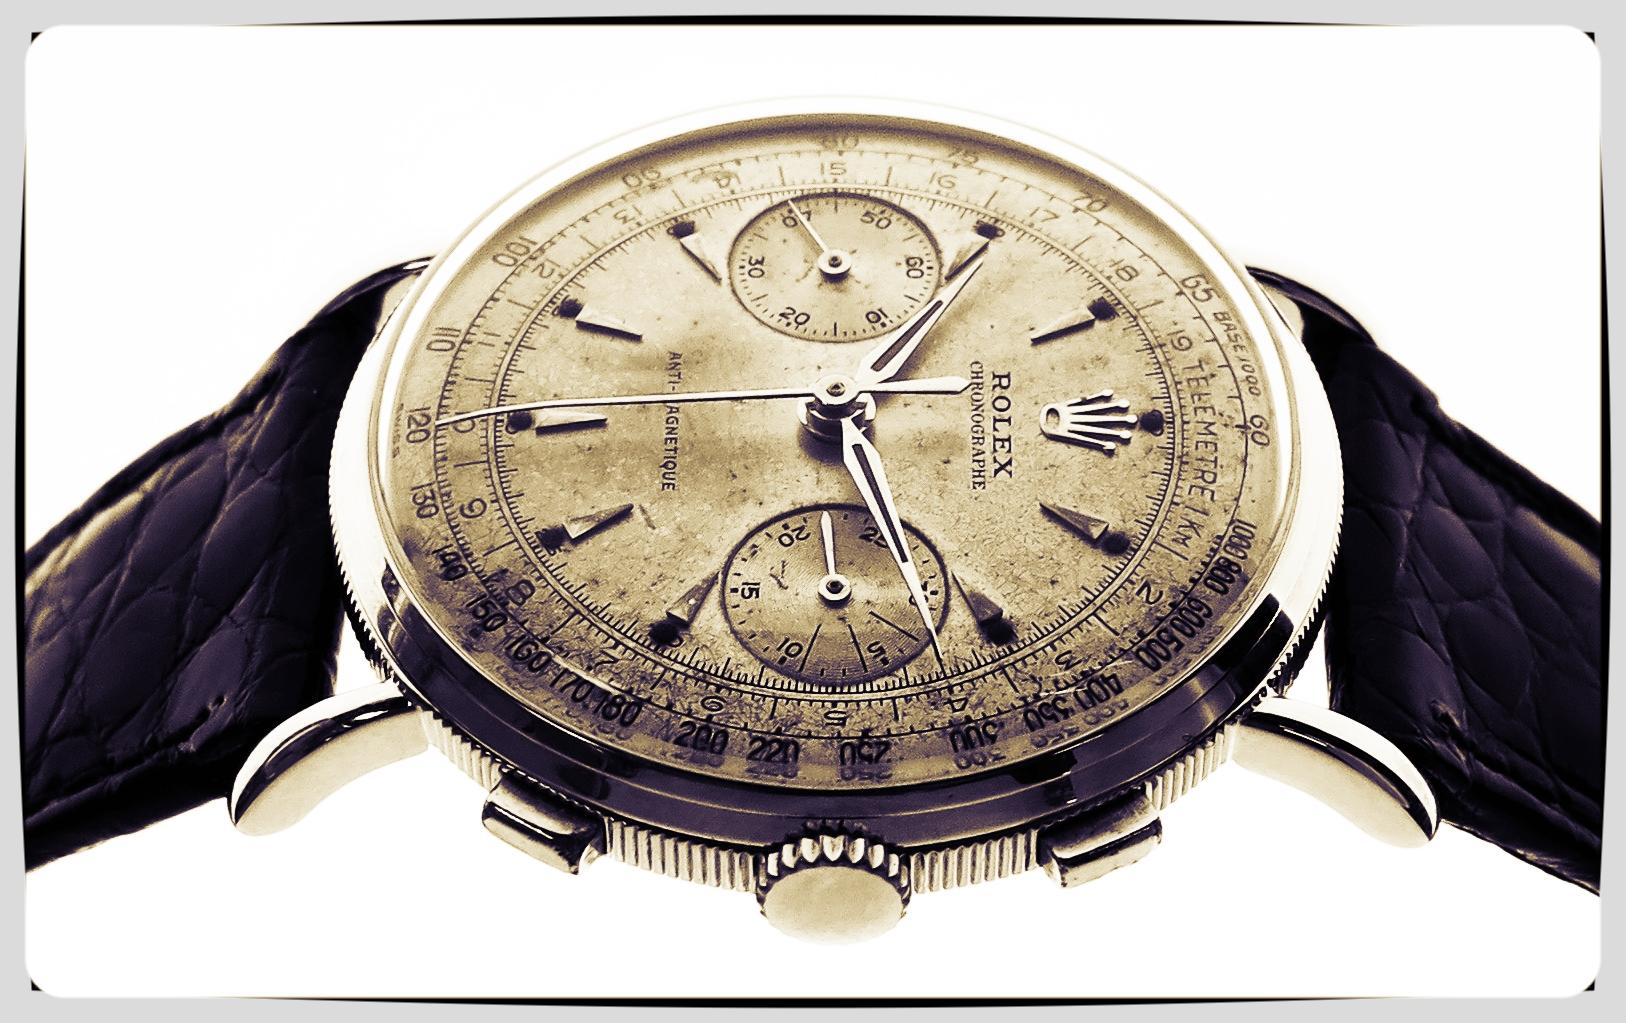 1950's Rolex Chronograph